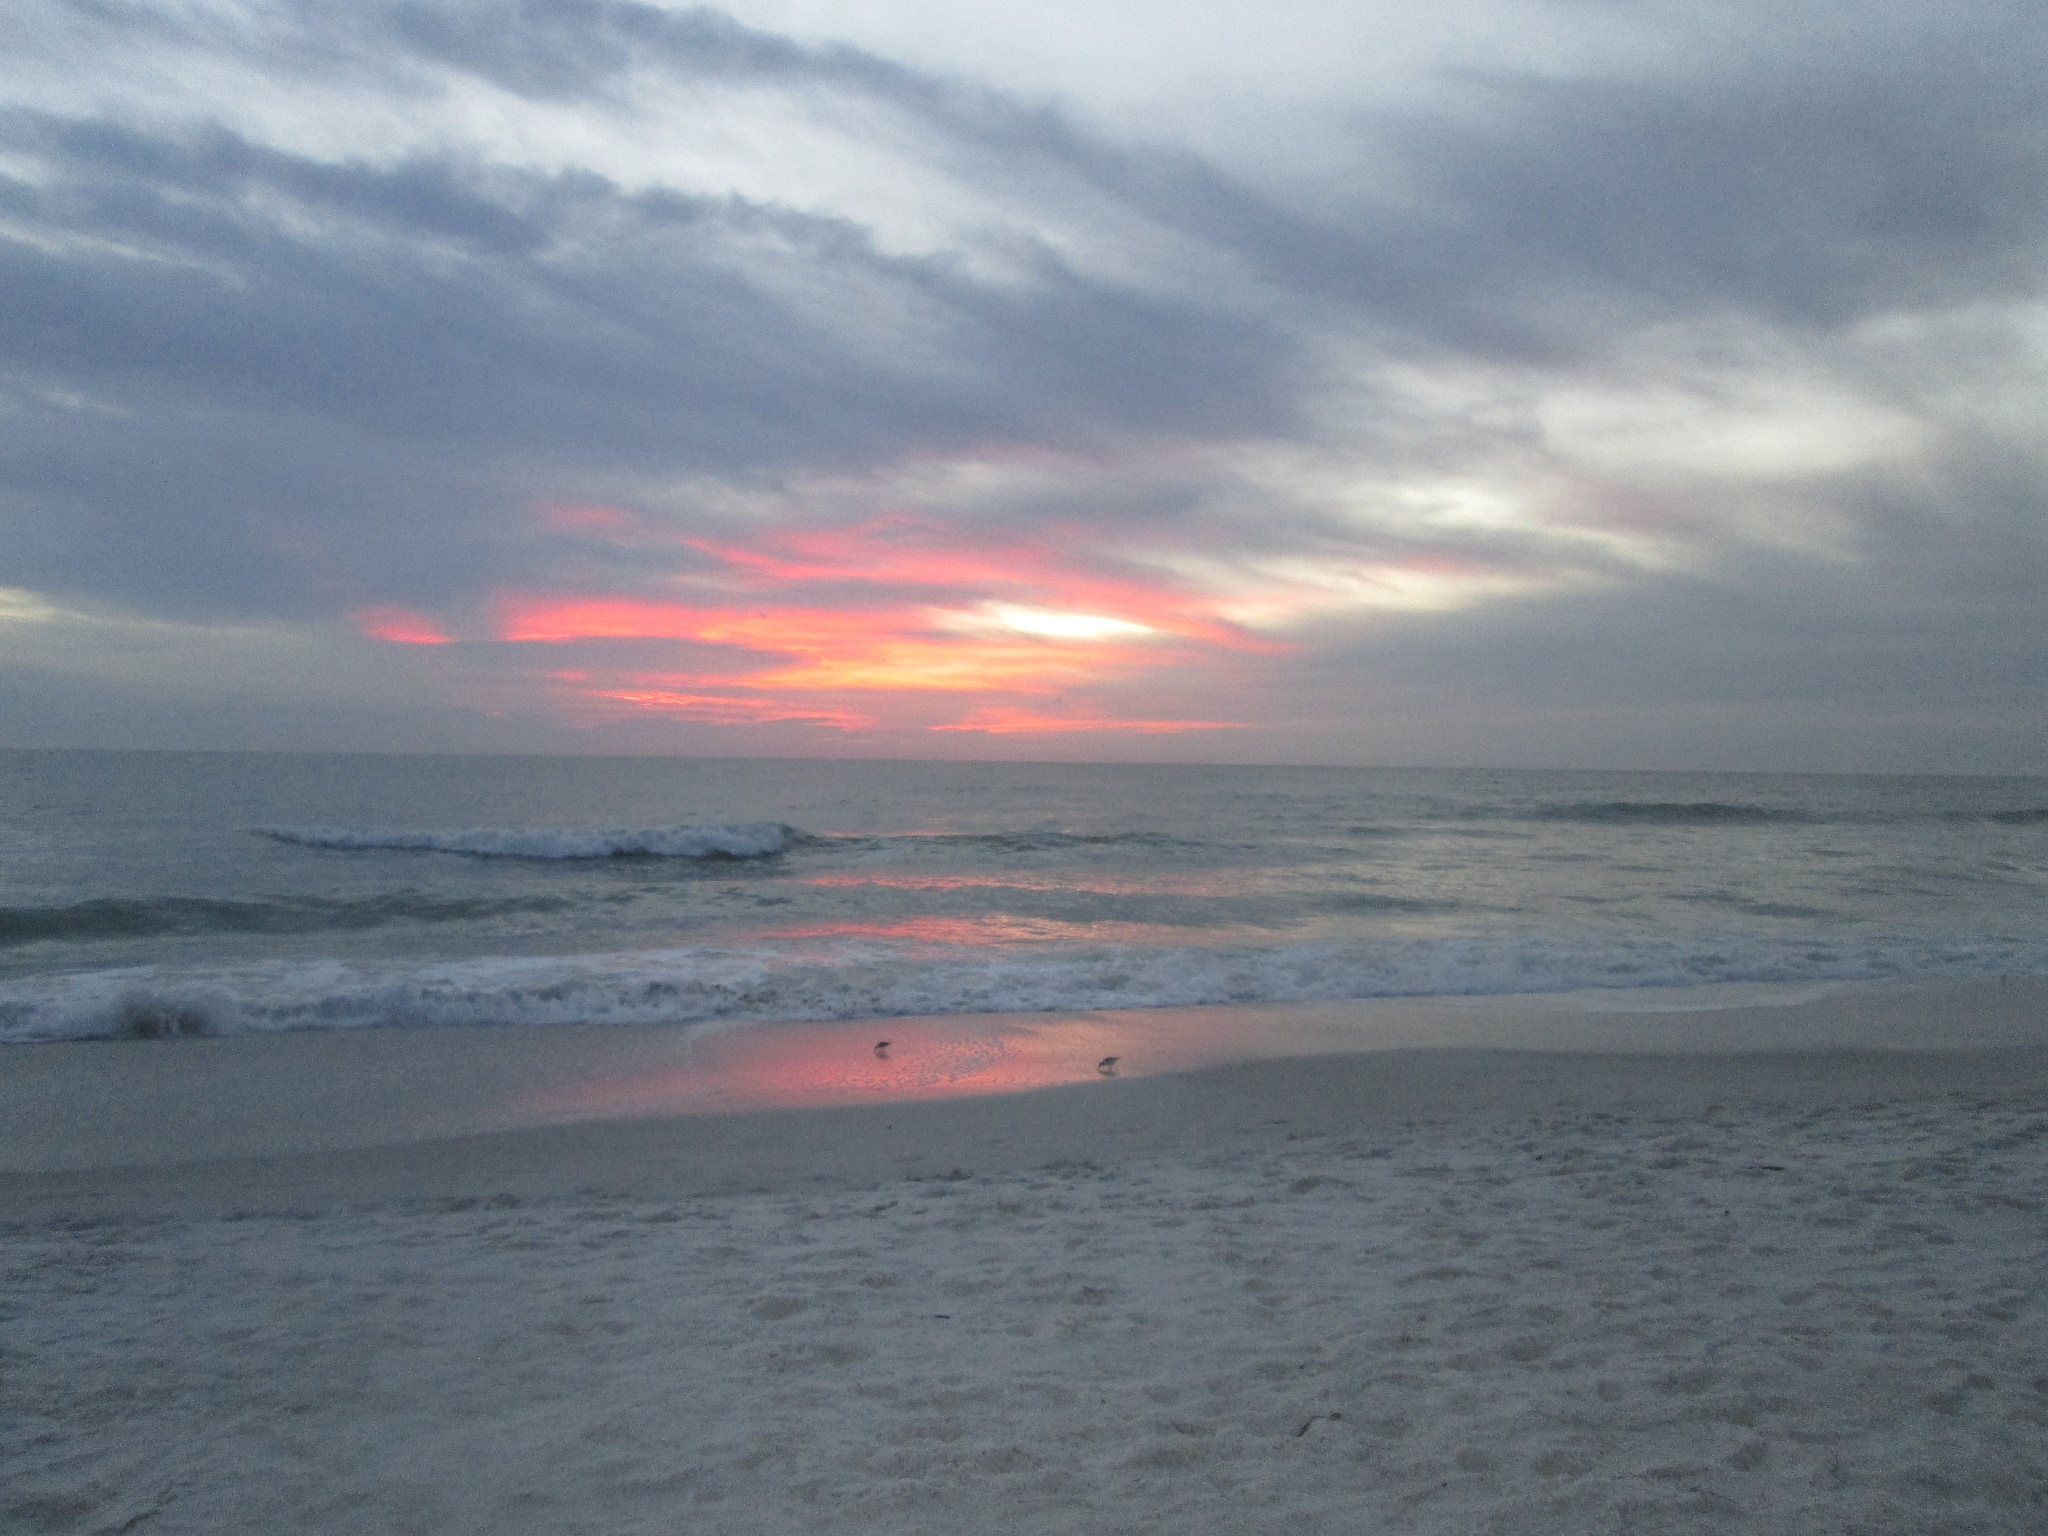 sunset on anna maria island by pamela.kanarr